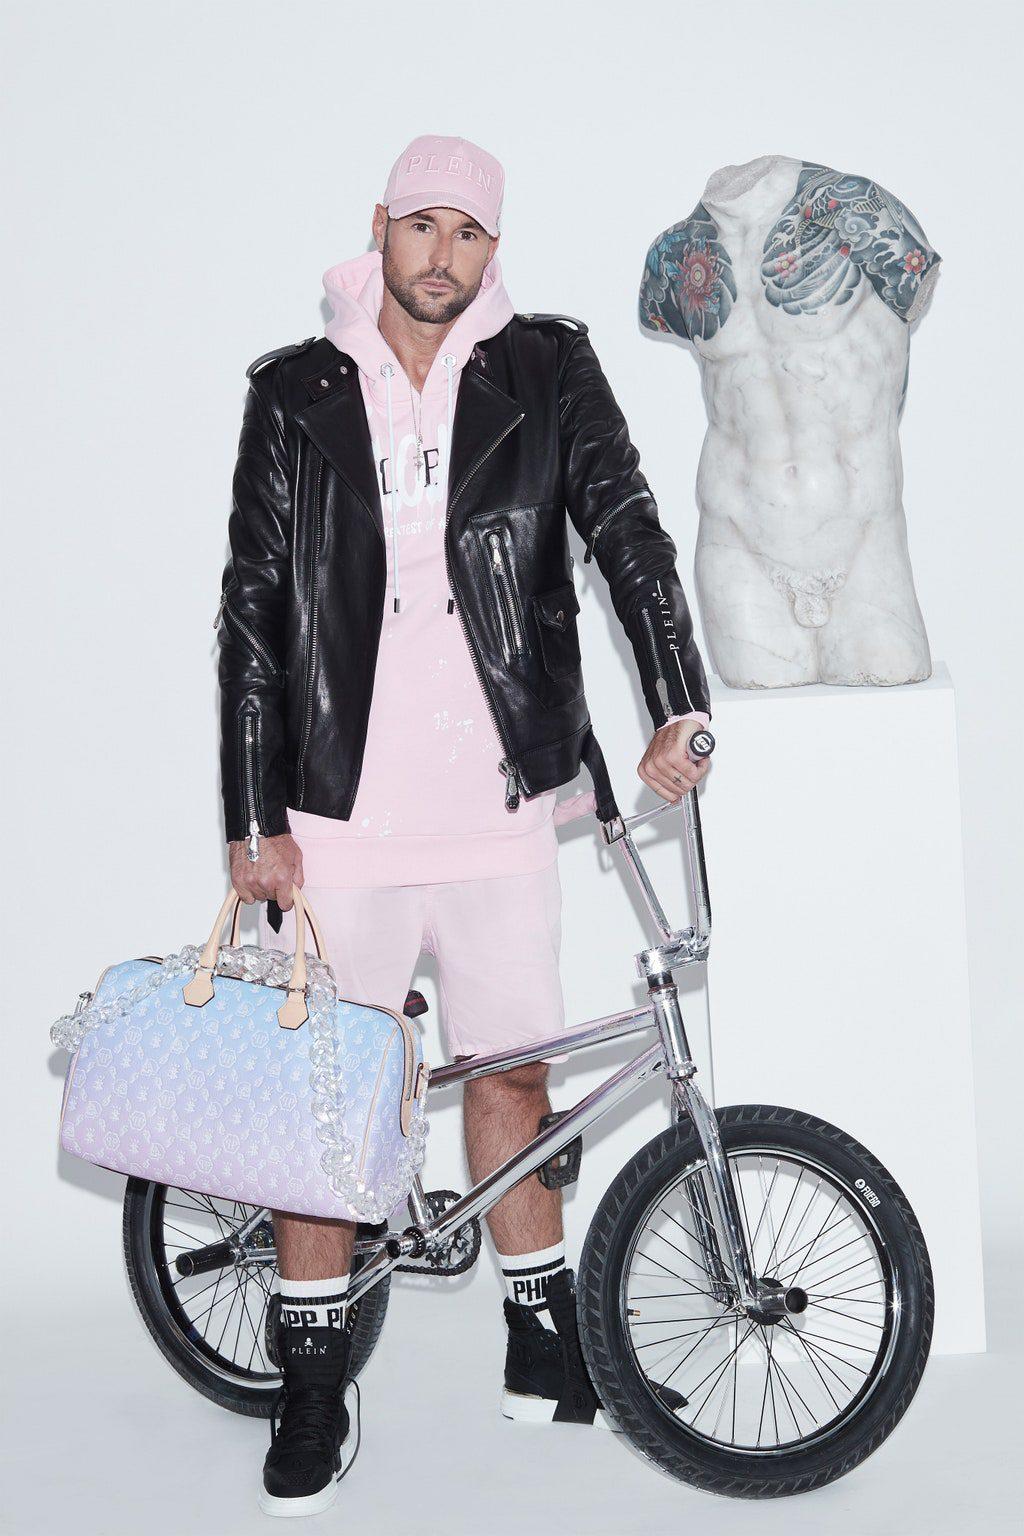 Philipp Plein Spring Summer 2021 Milan Digital Fashion Week by RUNWAY MAGAZINE